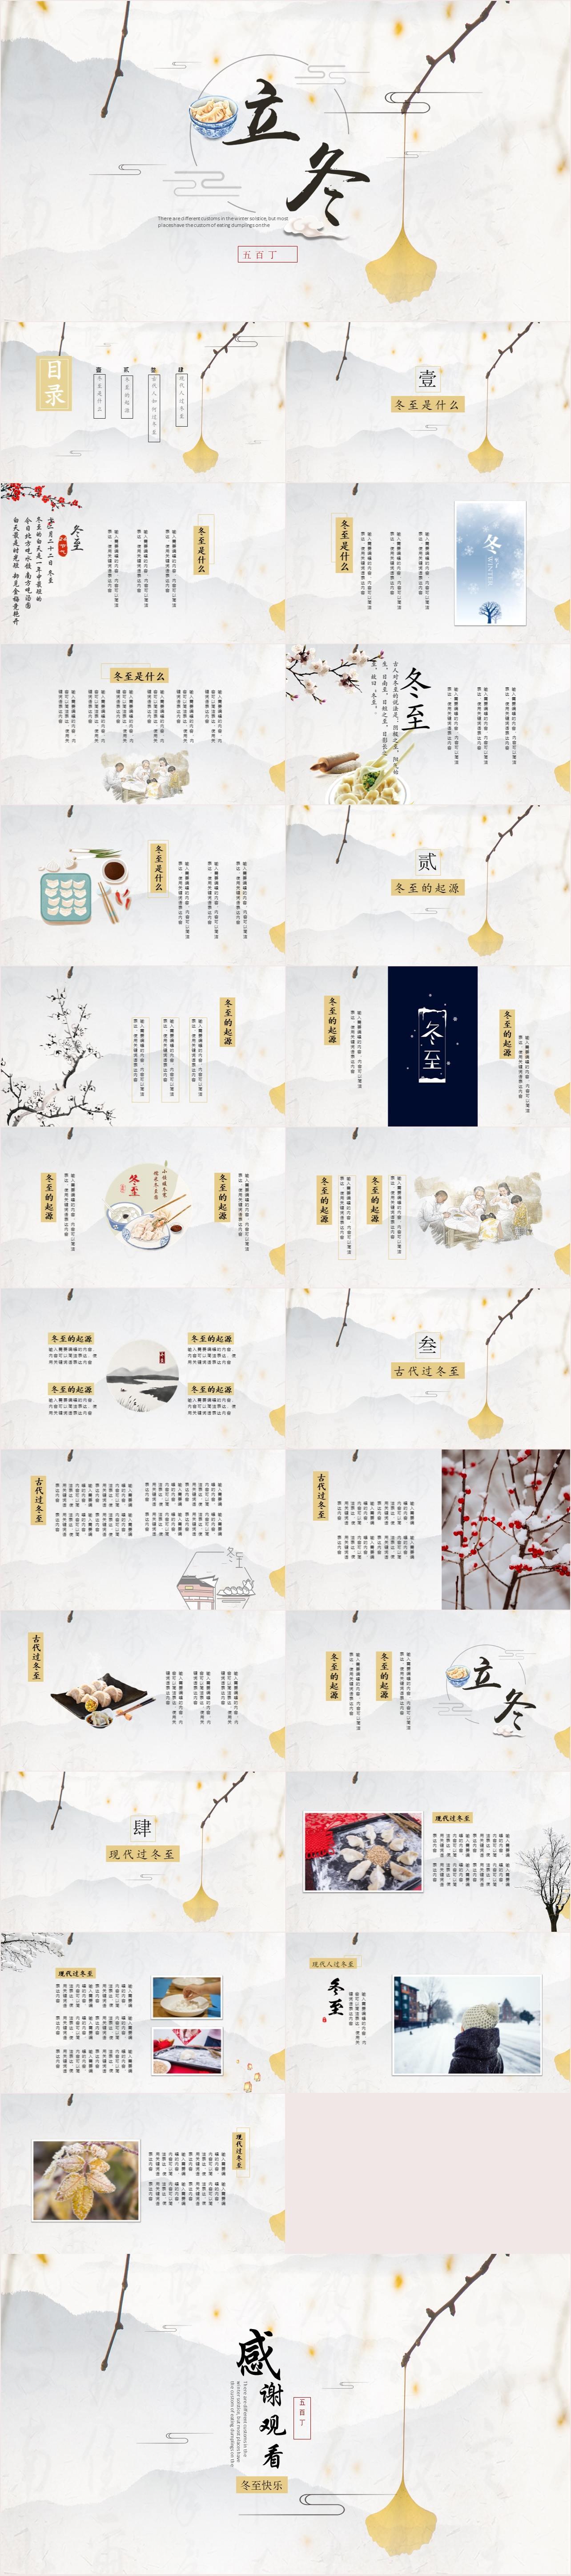 GL00152 黄色清新中国风教育冬至传统节日PPT模板